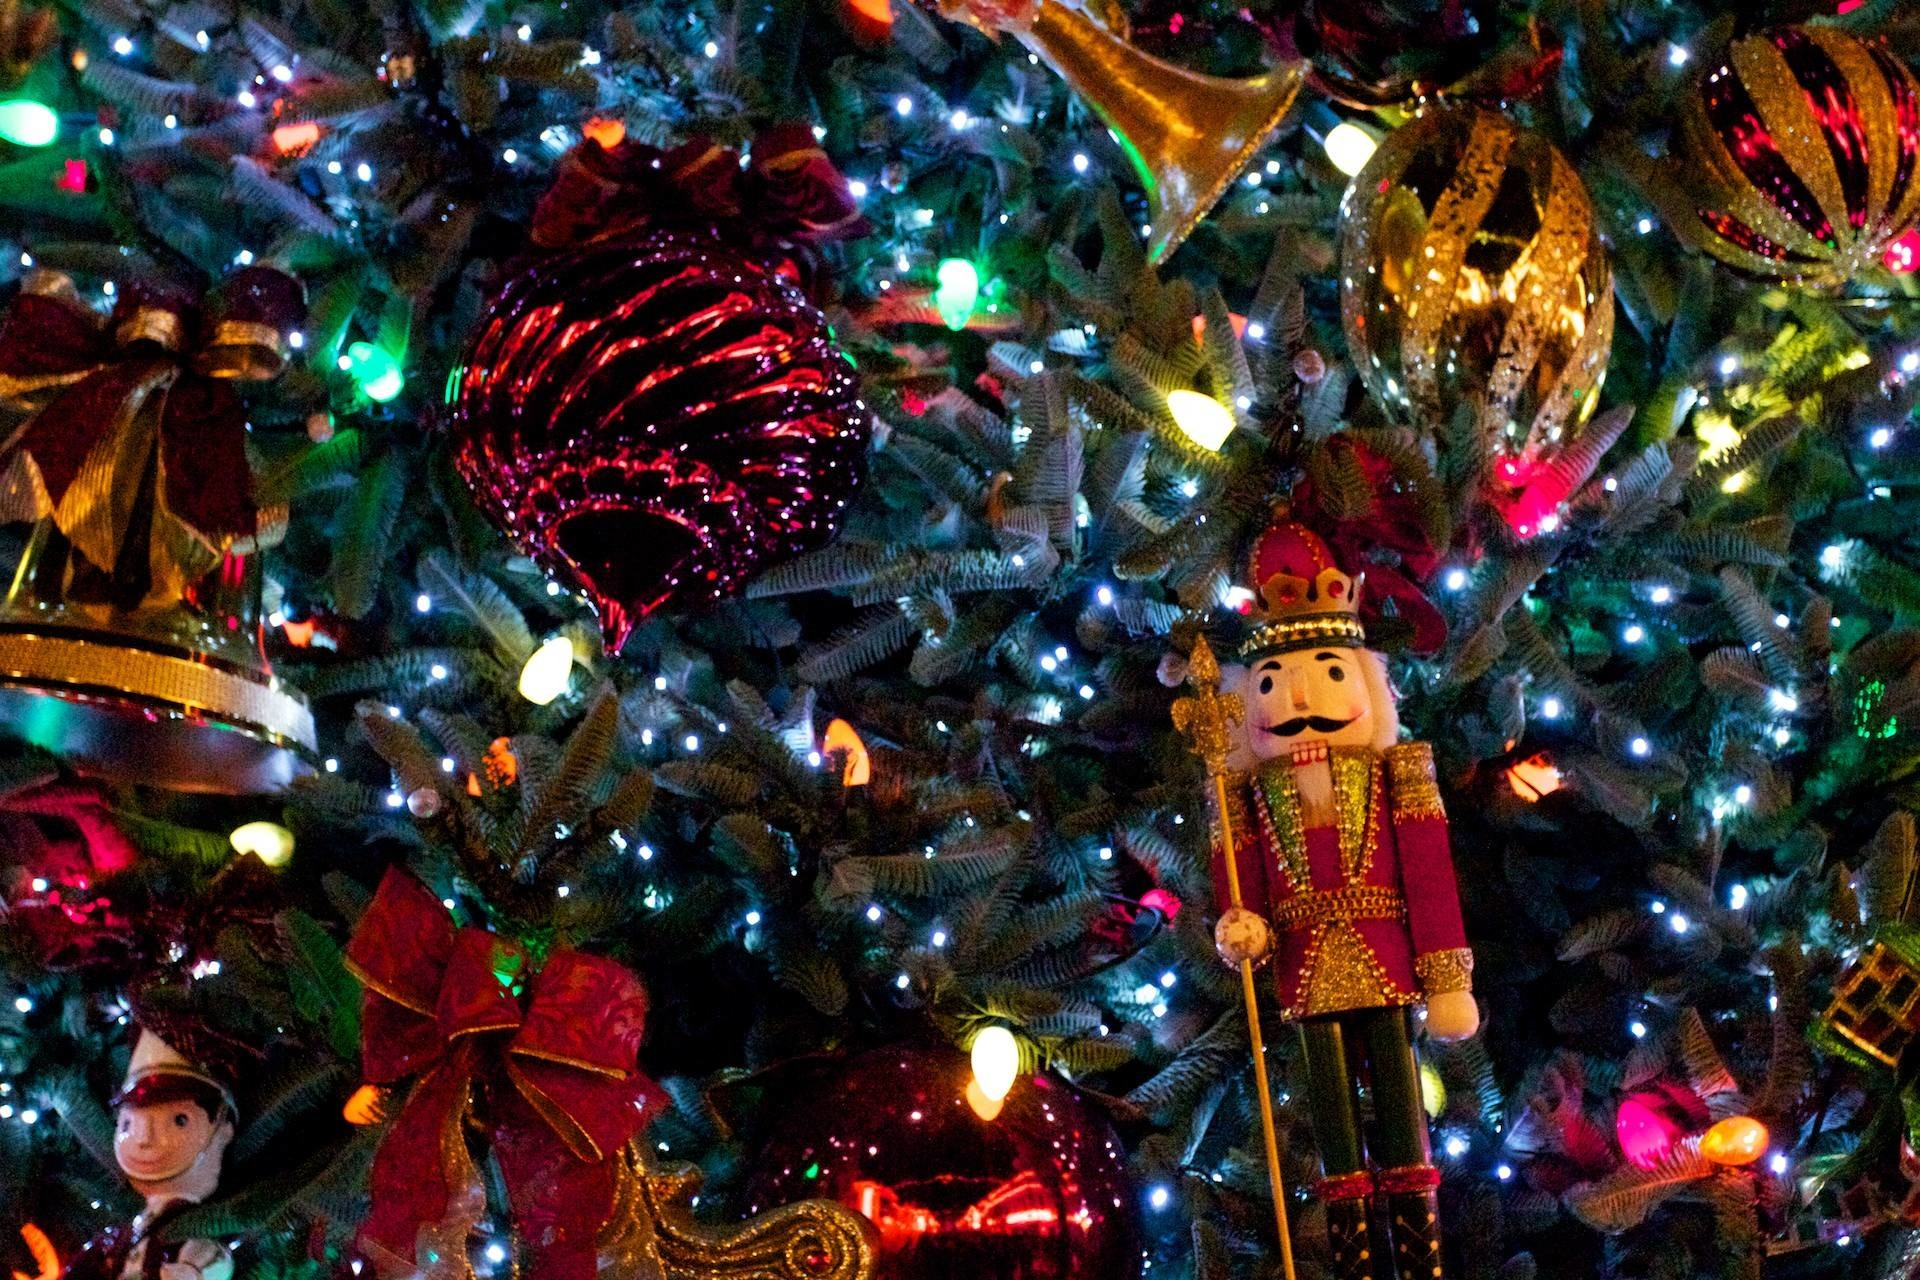 Res: 1920x1280, Christmas Tree with Nutcracker Desktop Wallpaper PX .